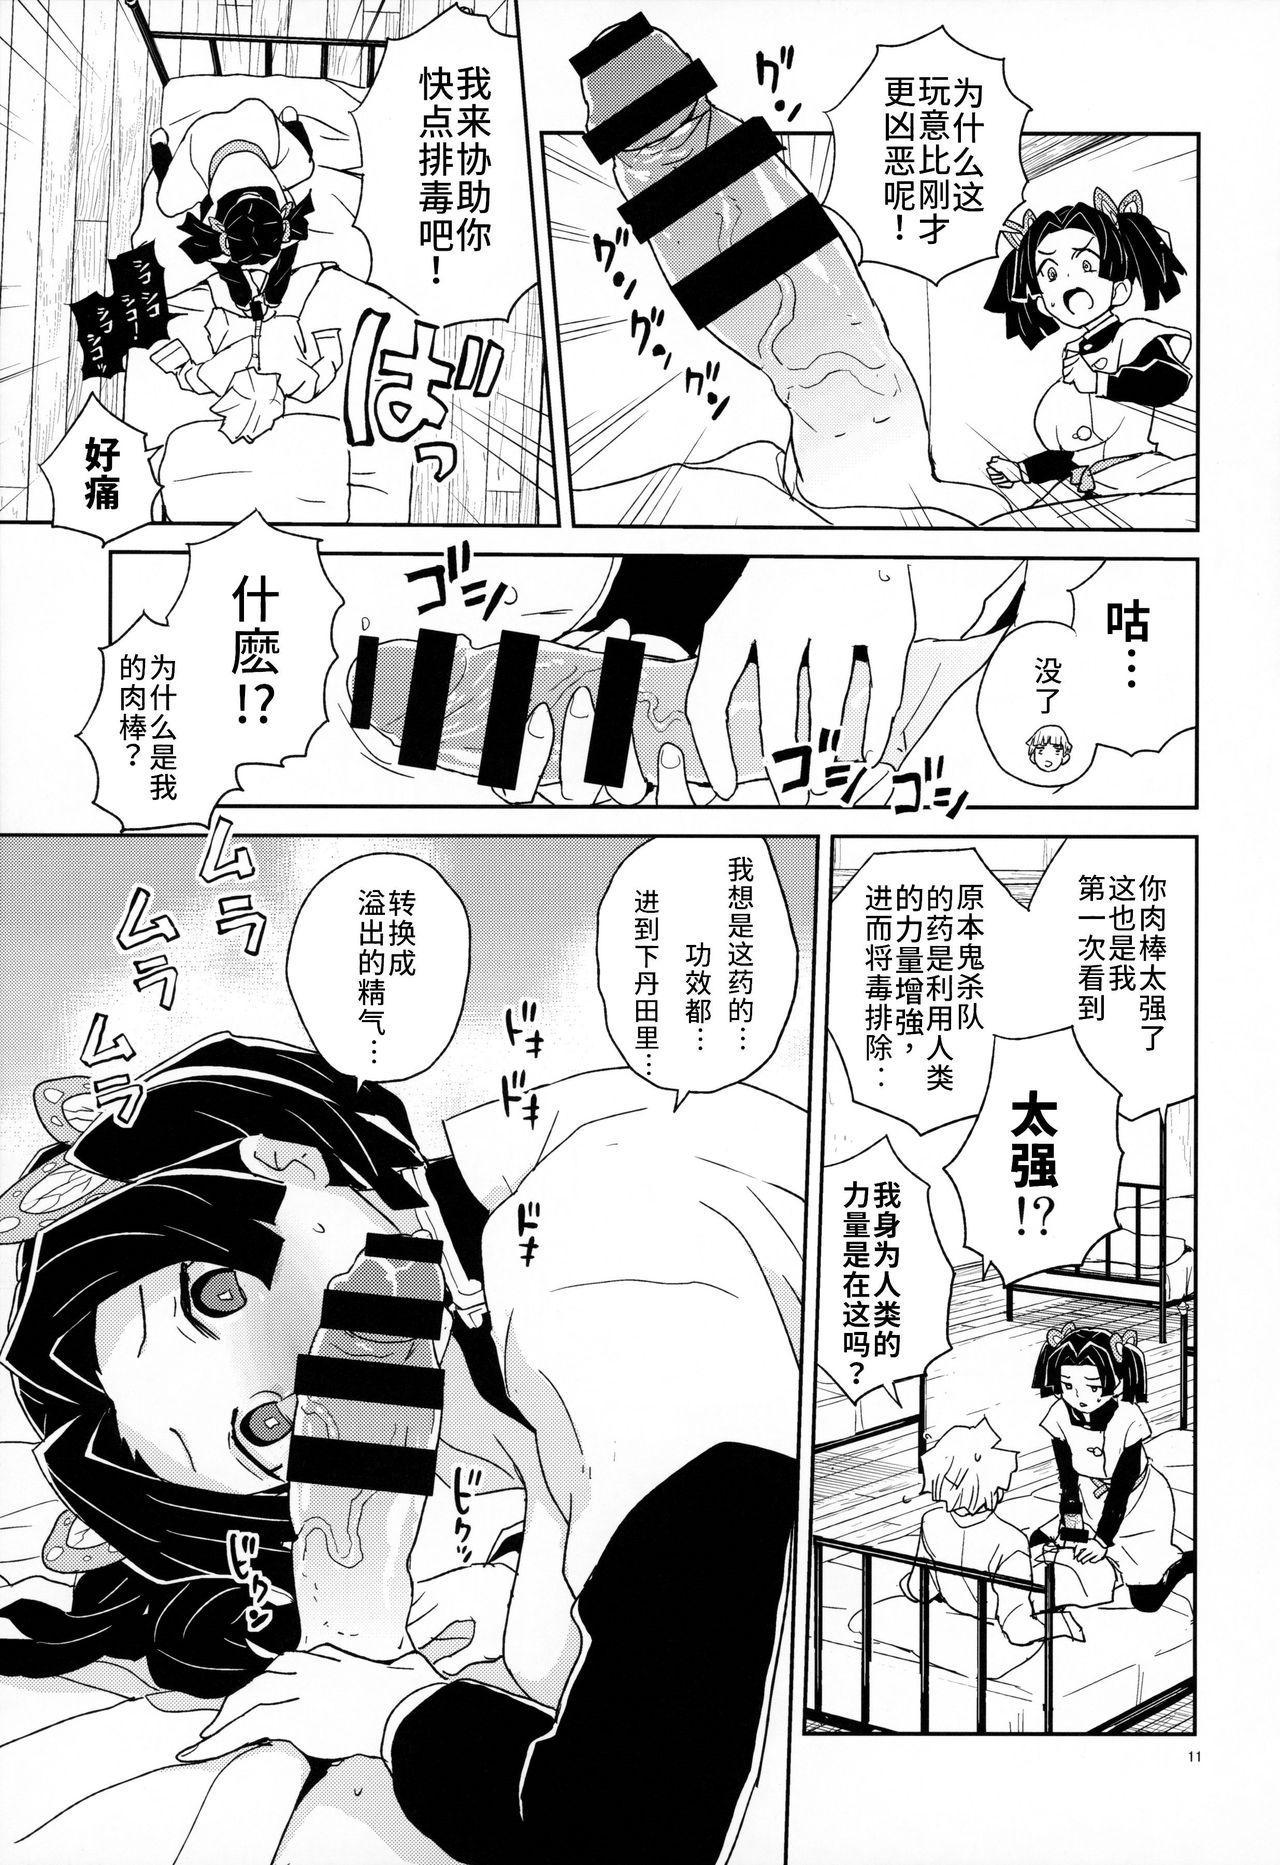 Kanzaki Aoi-chan Arigatou Itsumo Atatakai Kango o Shite Kurete... 9